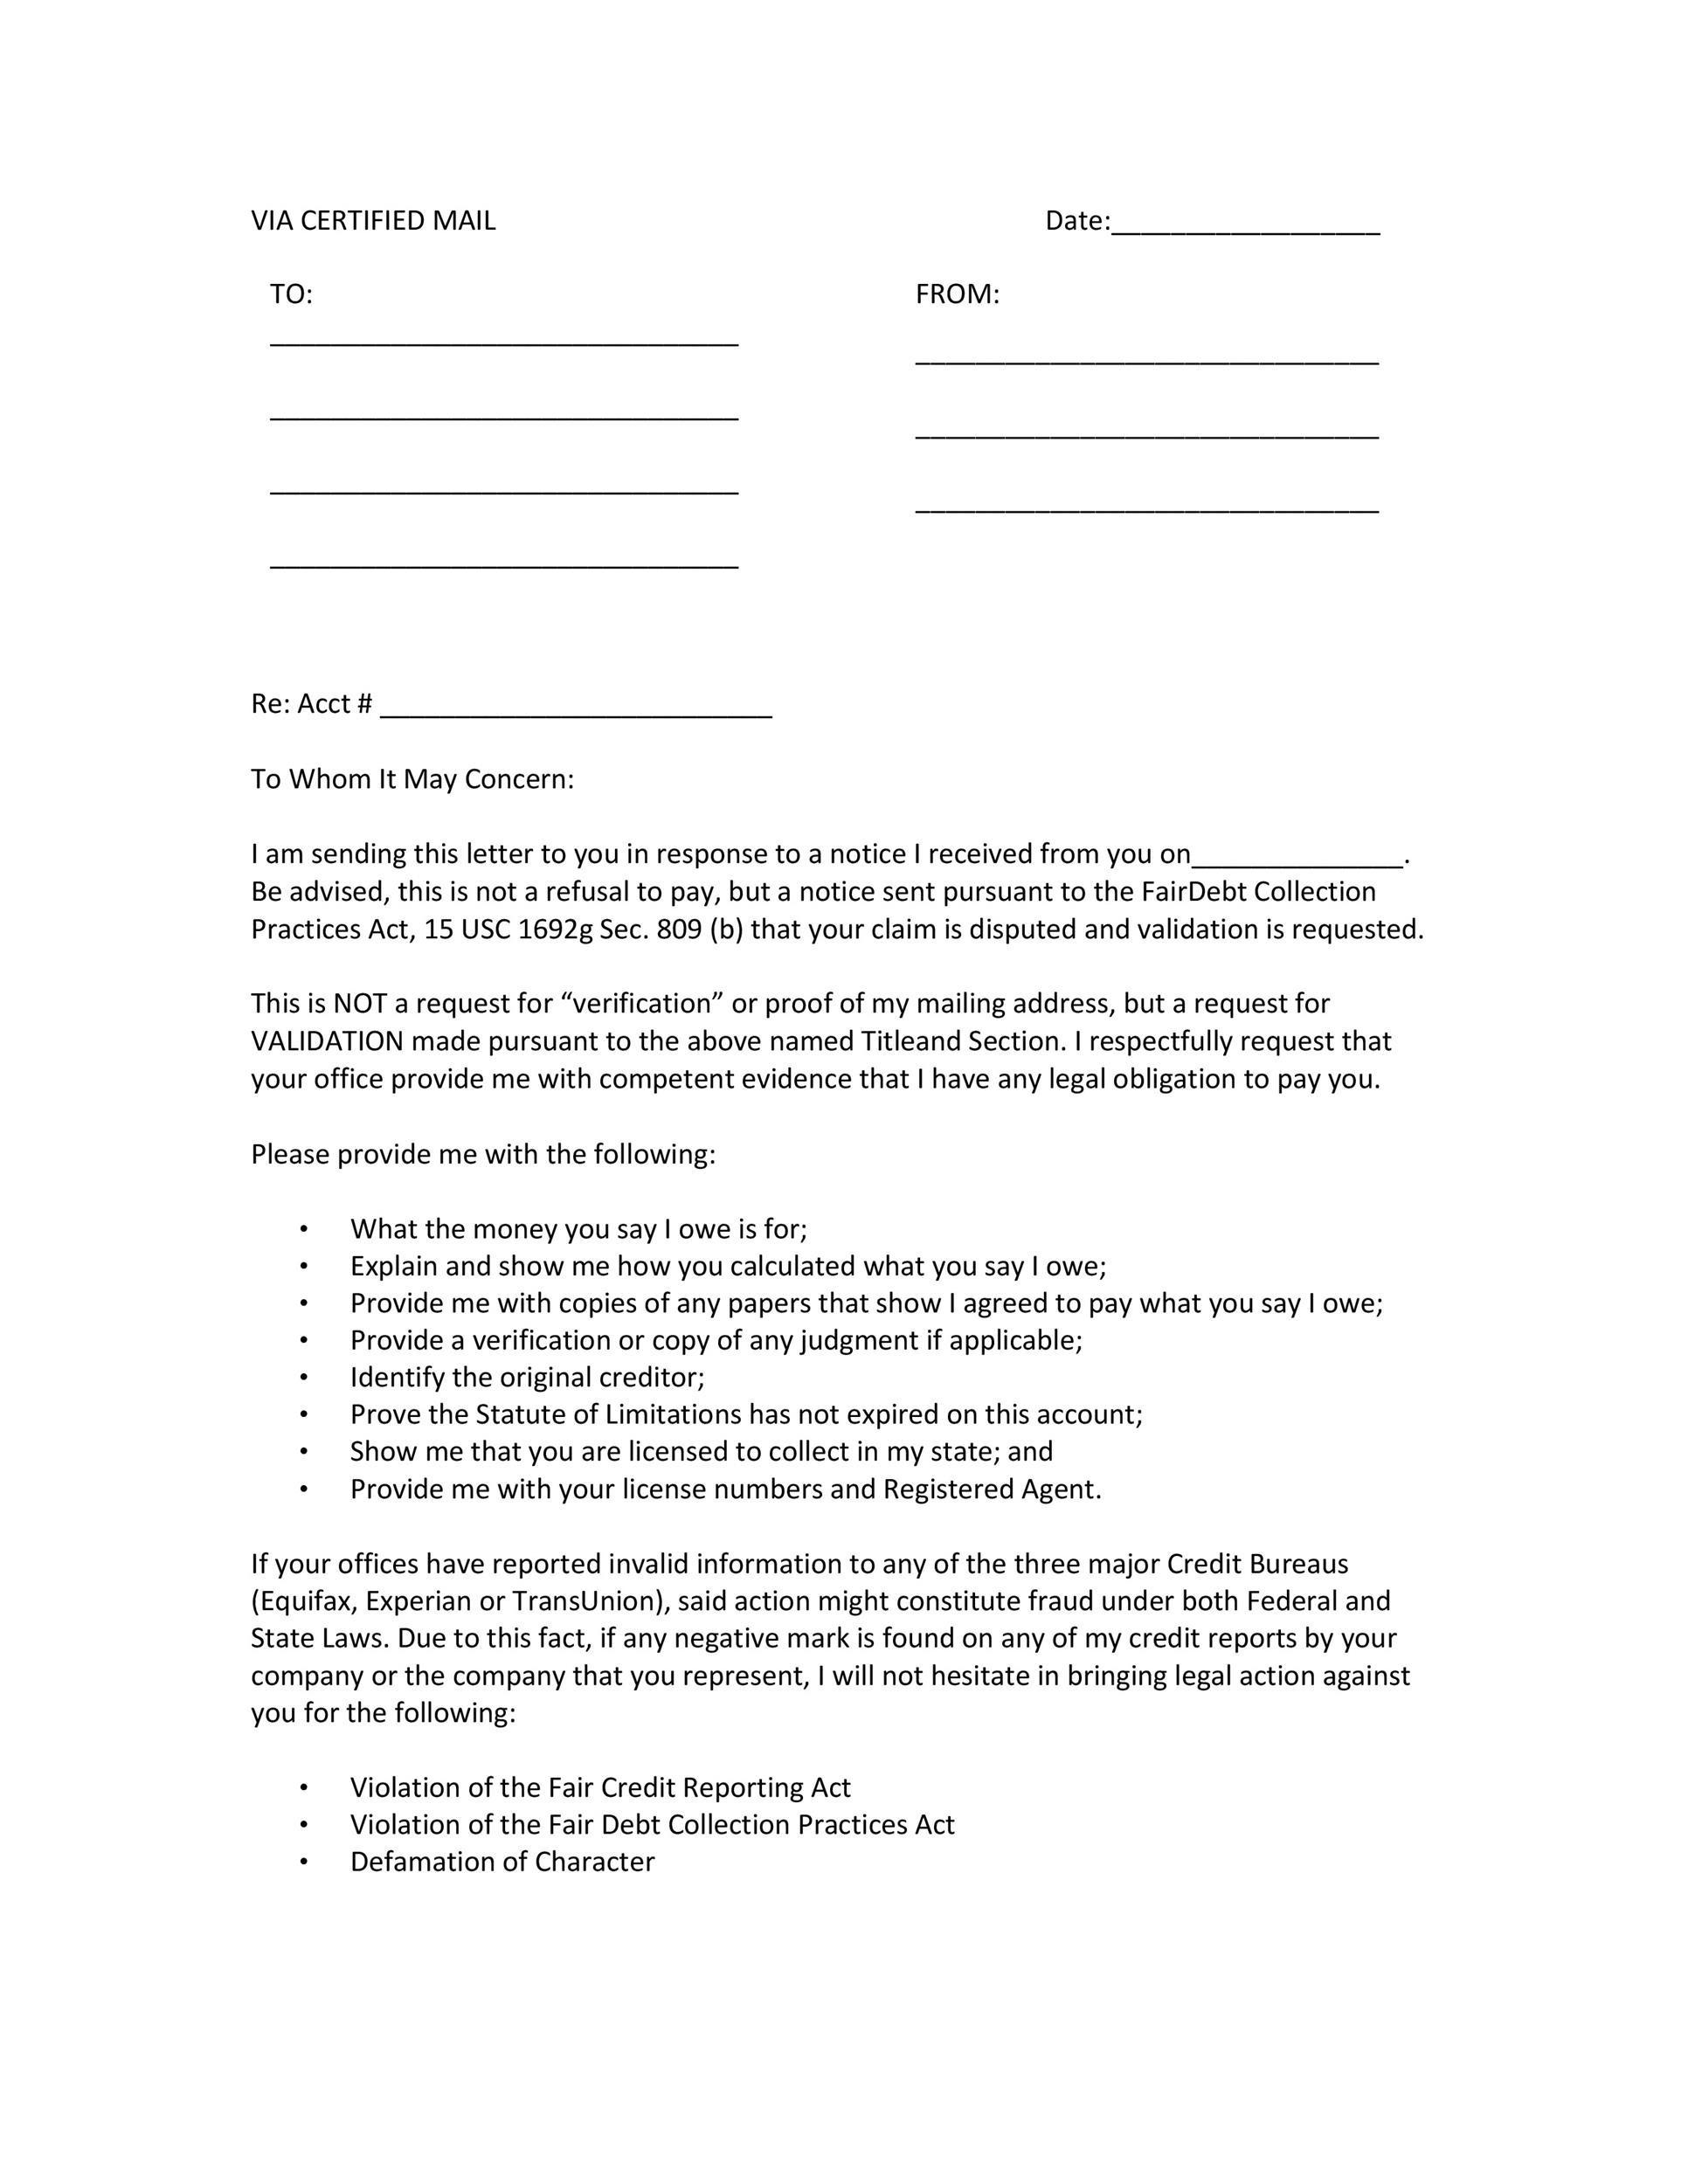 Free debt validation letter 04